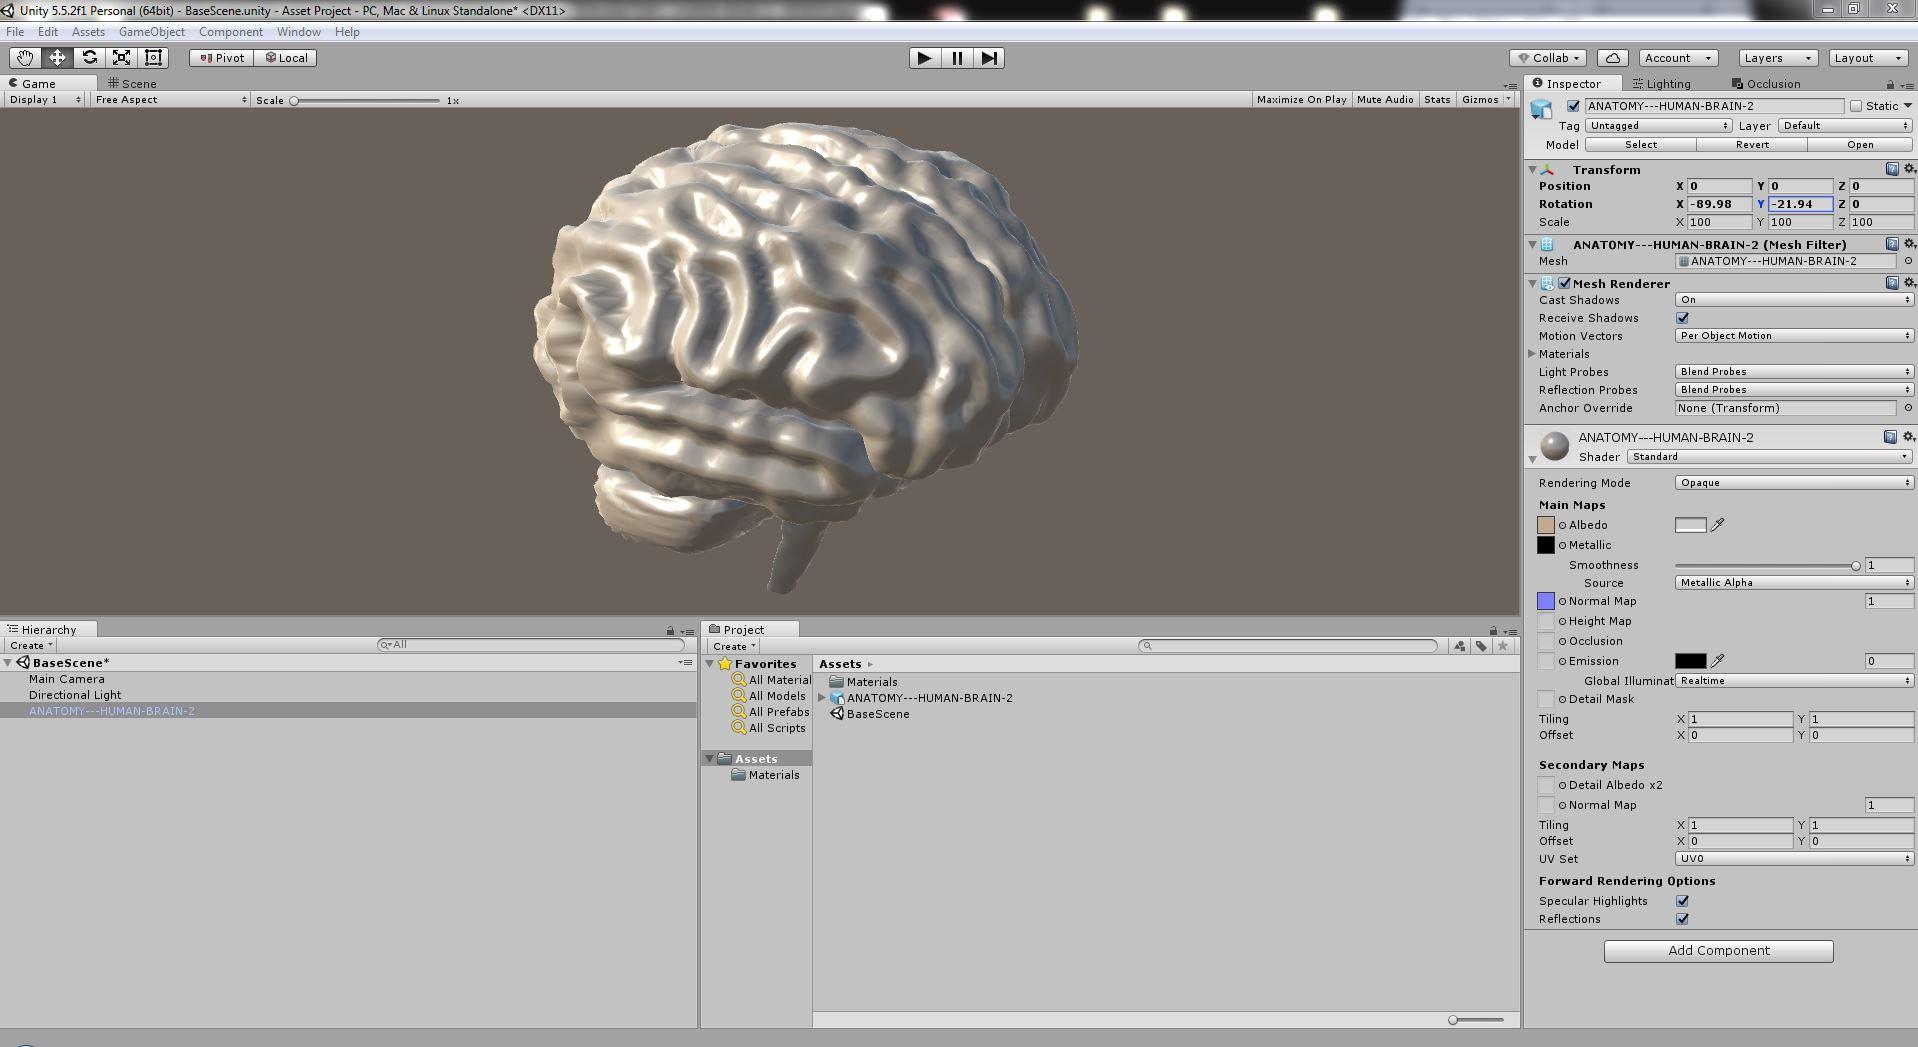 Anatomy - Human Brain 2 by FrancescoMilanese | 3DOcean